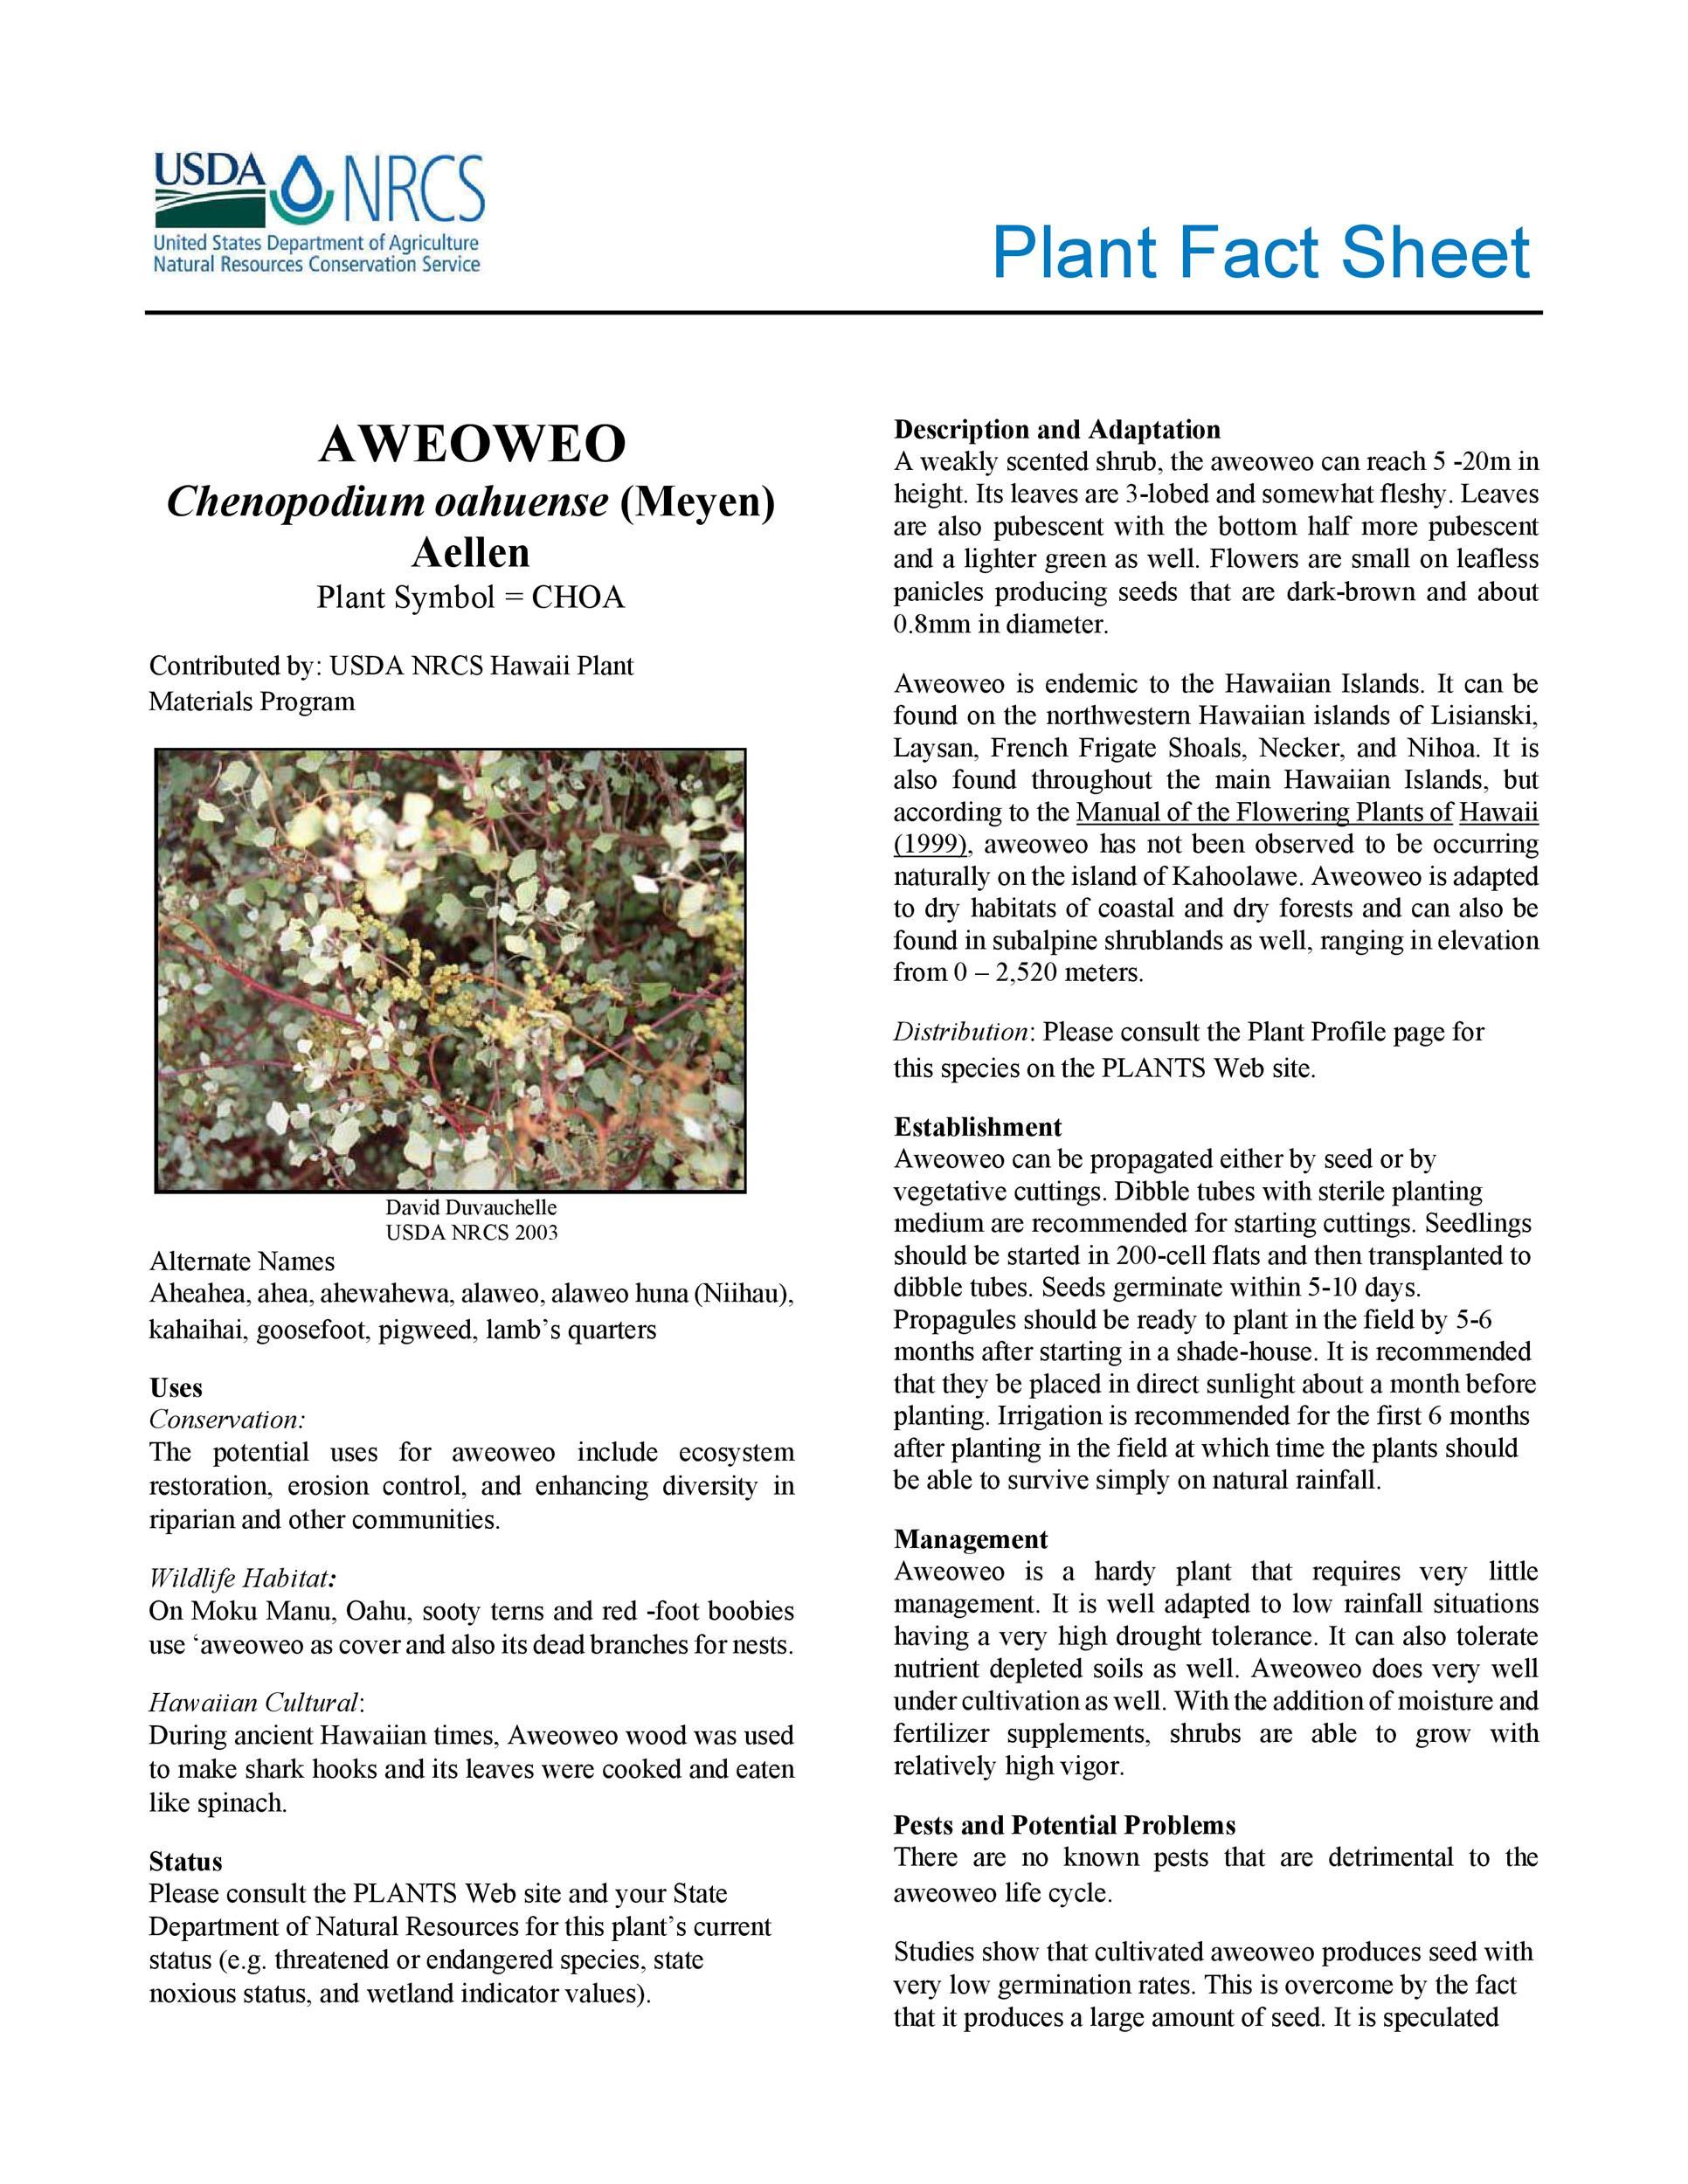 Free Fact sheet Template 50